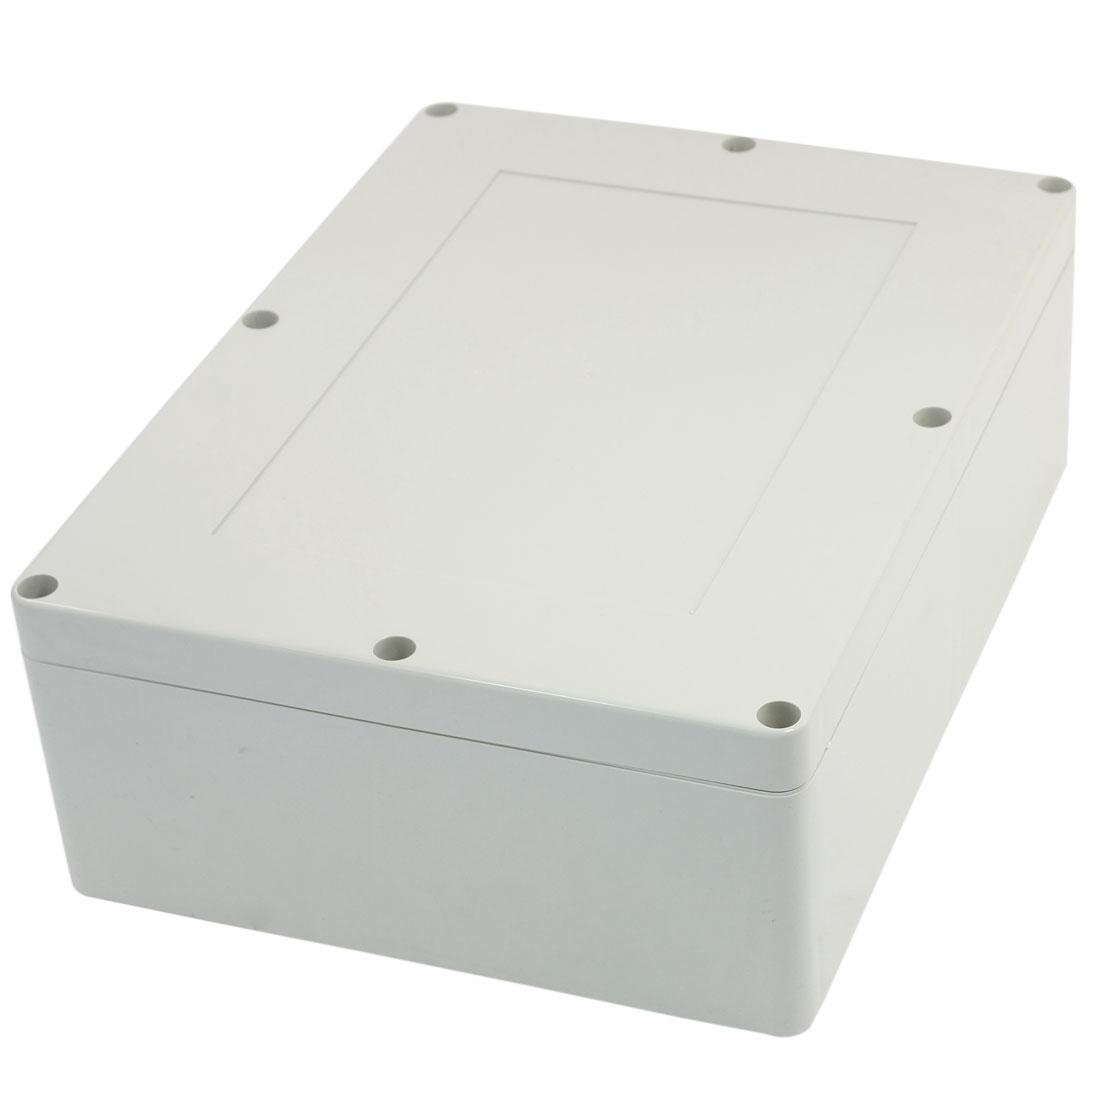 Waterproof-Plastic-Sealed-Enclosure-Case-Junction-Box-320x240x110mm